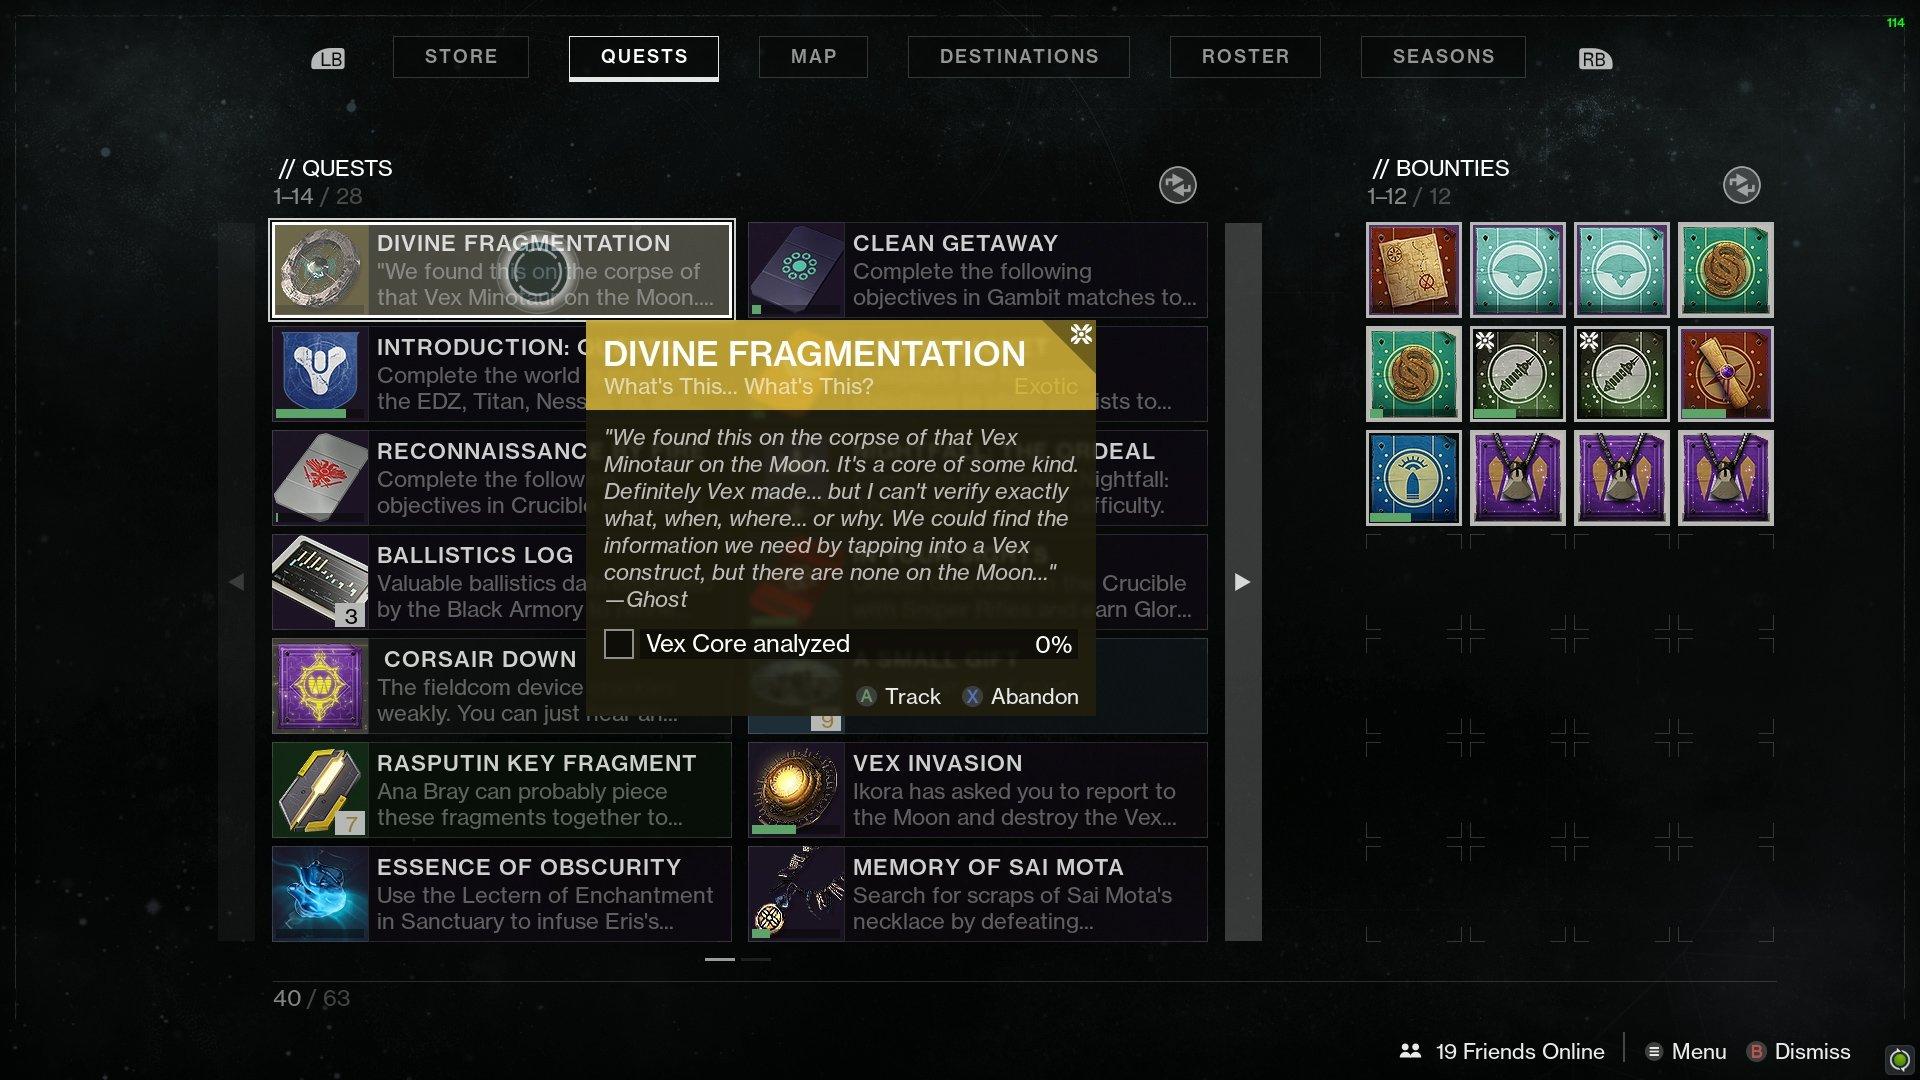 Divine Fragmentation Vex Cores Analyzed Destiny 2